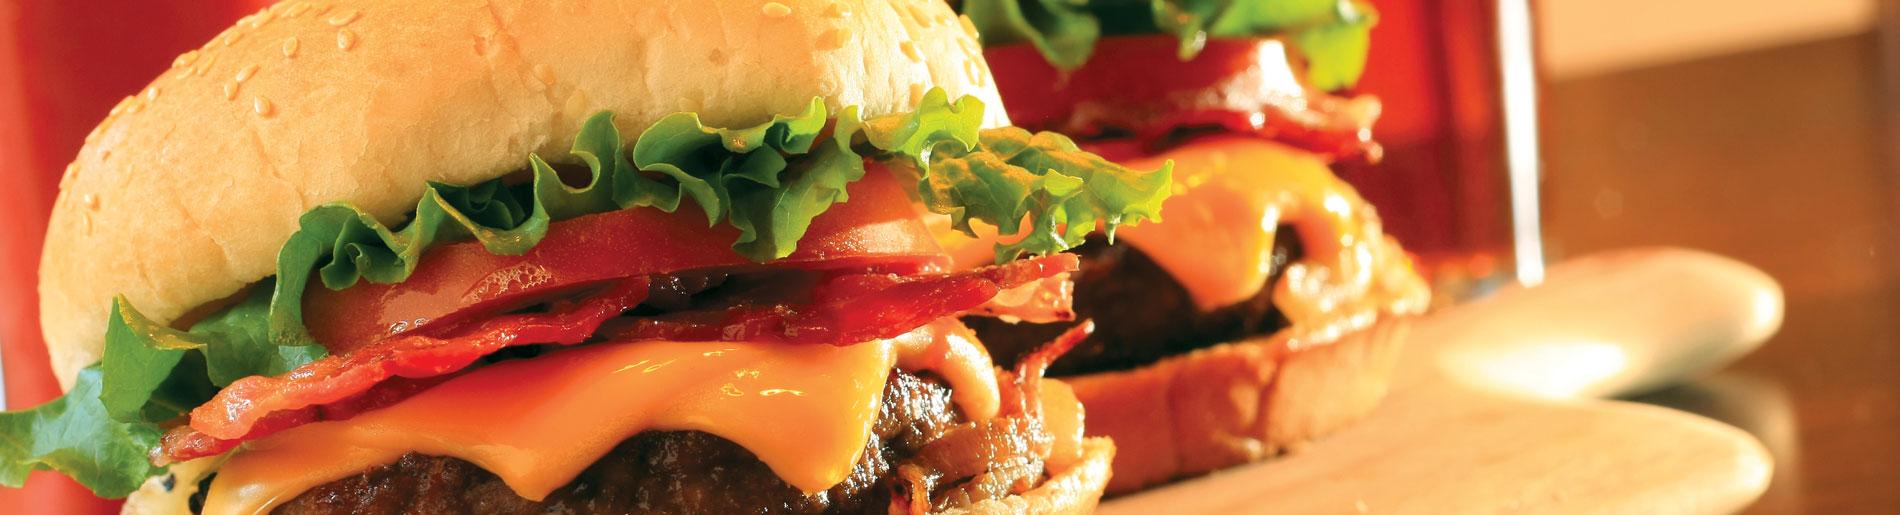 burgers_1900x515